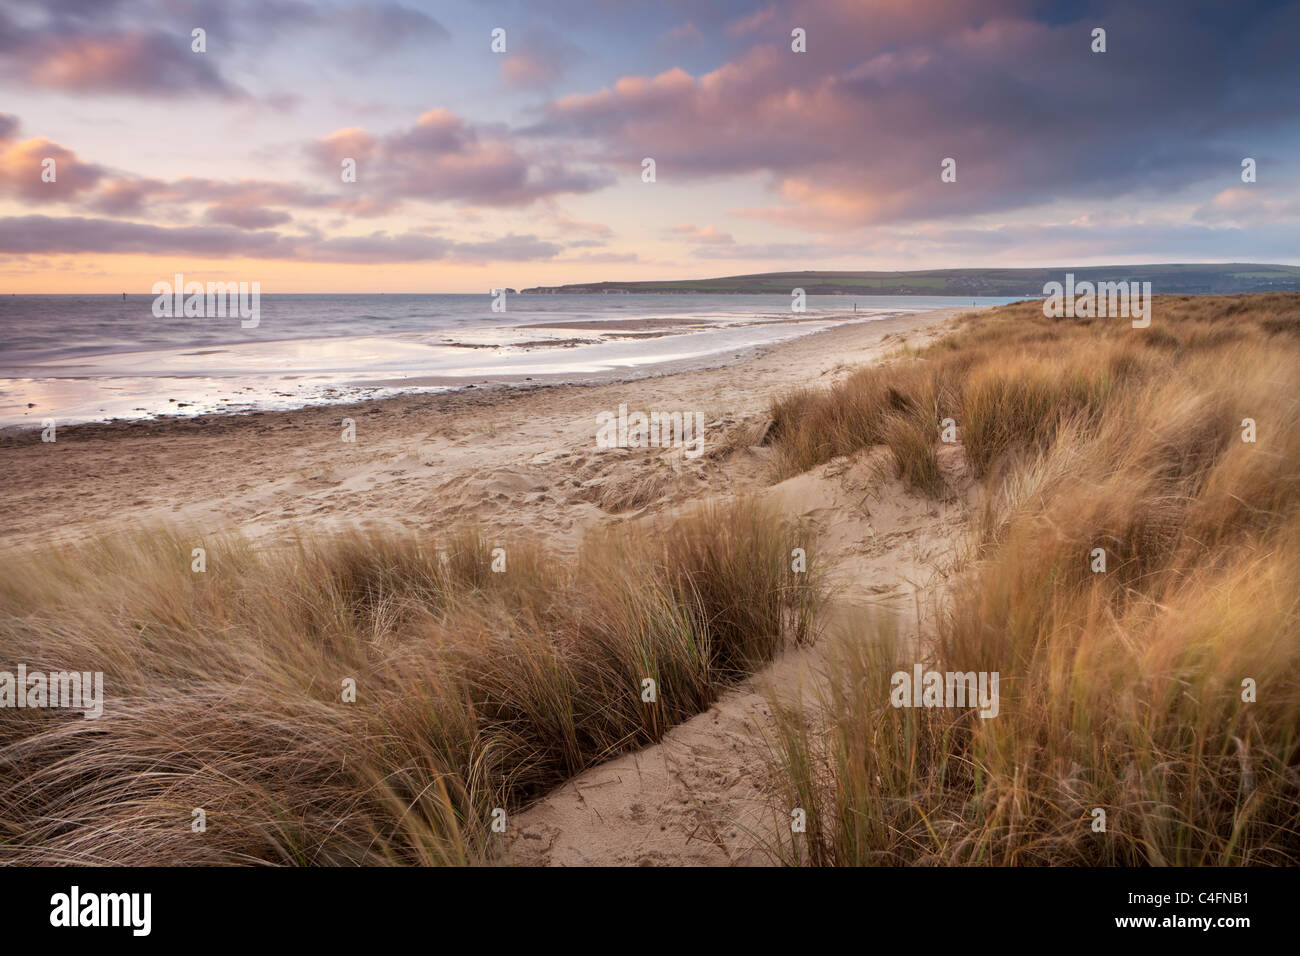 Windswept sand dunes on the beach at Studland Bay, Dorset, England. Winter (February) 2011. - Stock Image